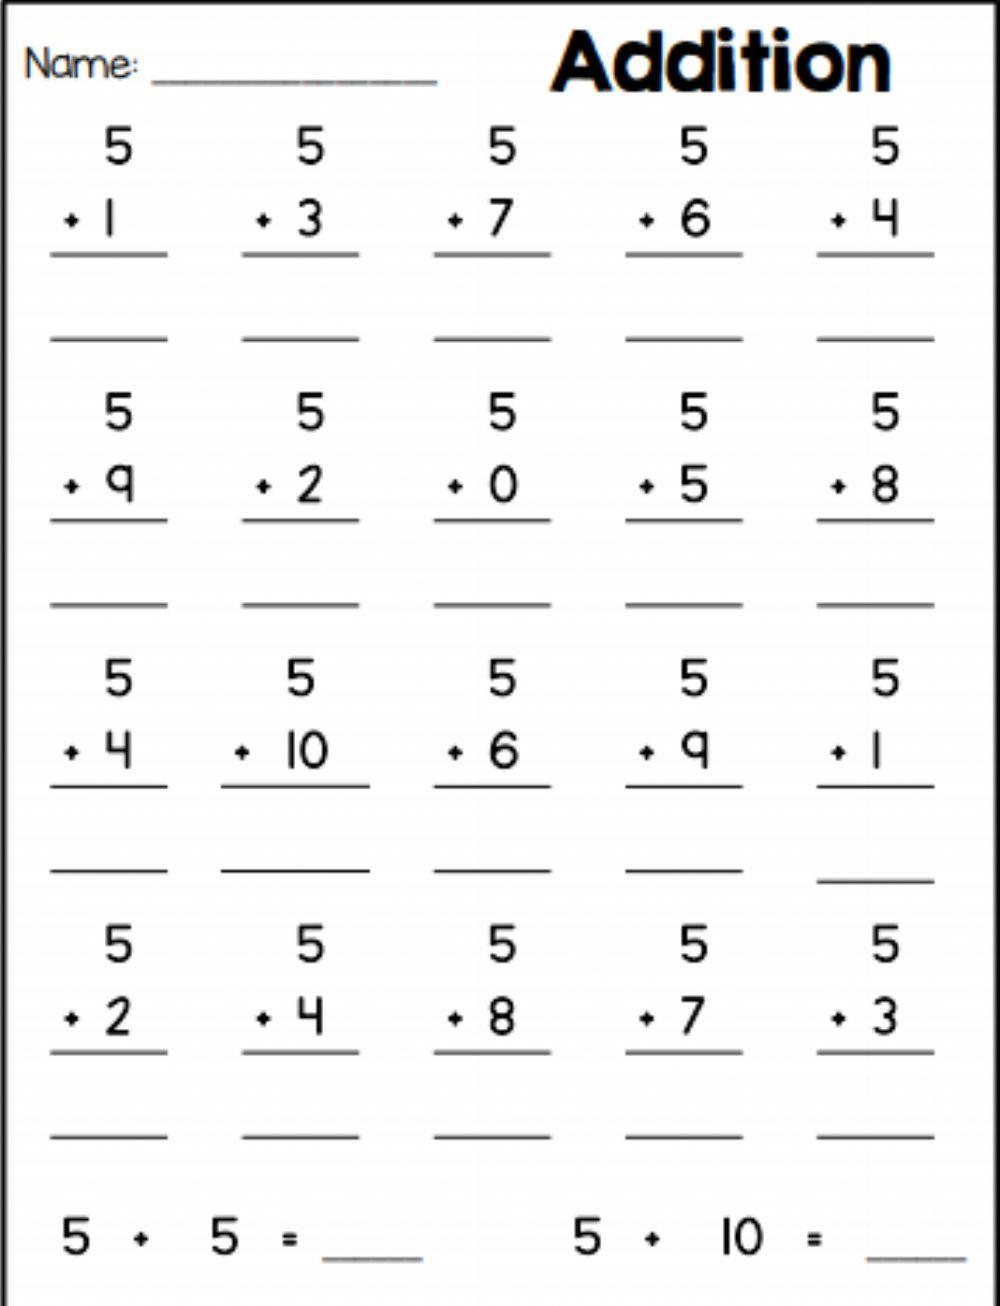 Addition Mathematics Quizizz Quizizz adding and subtracting